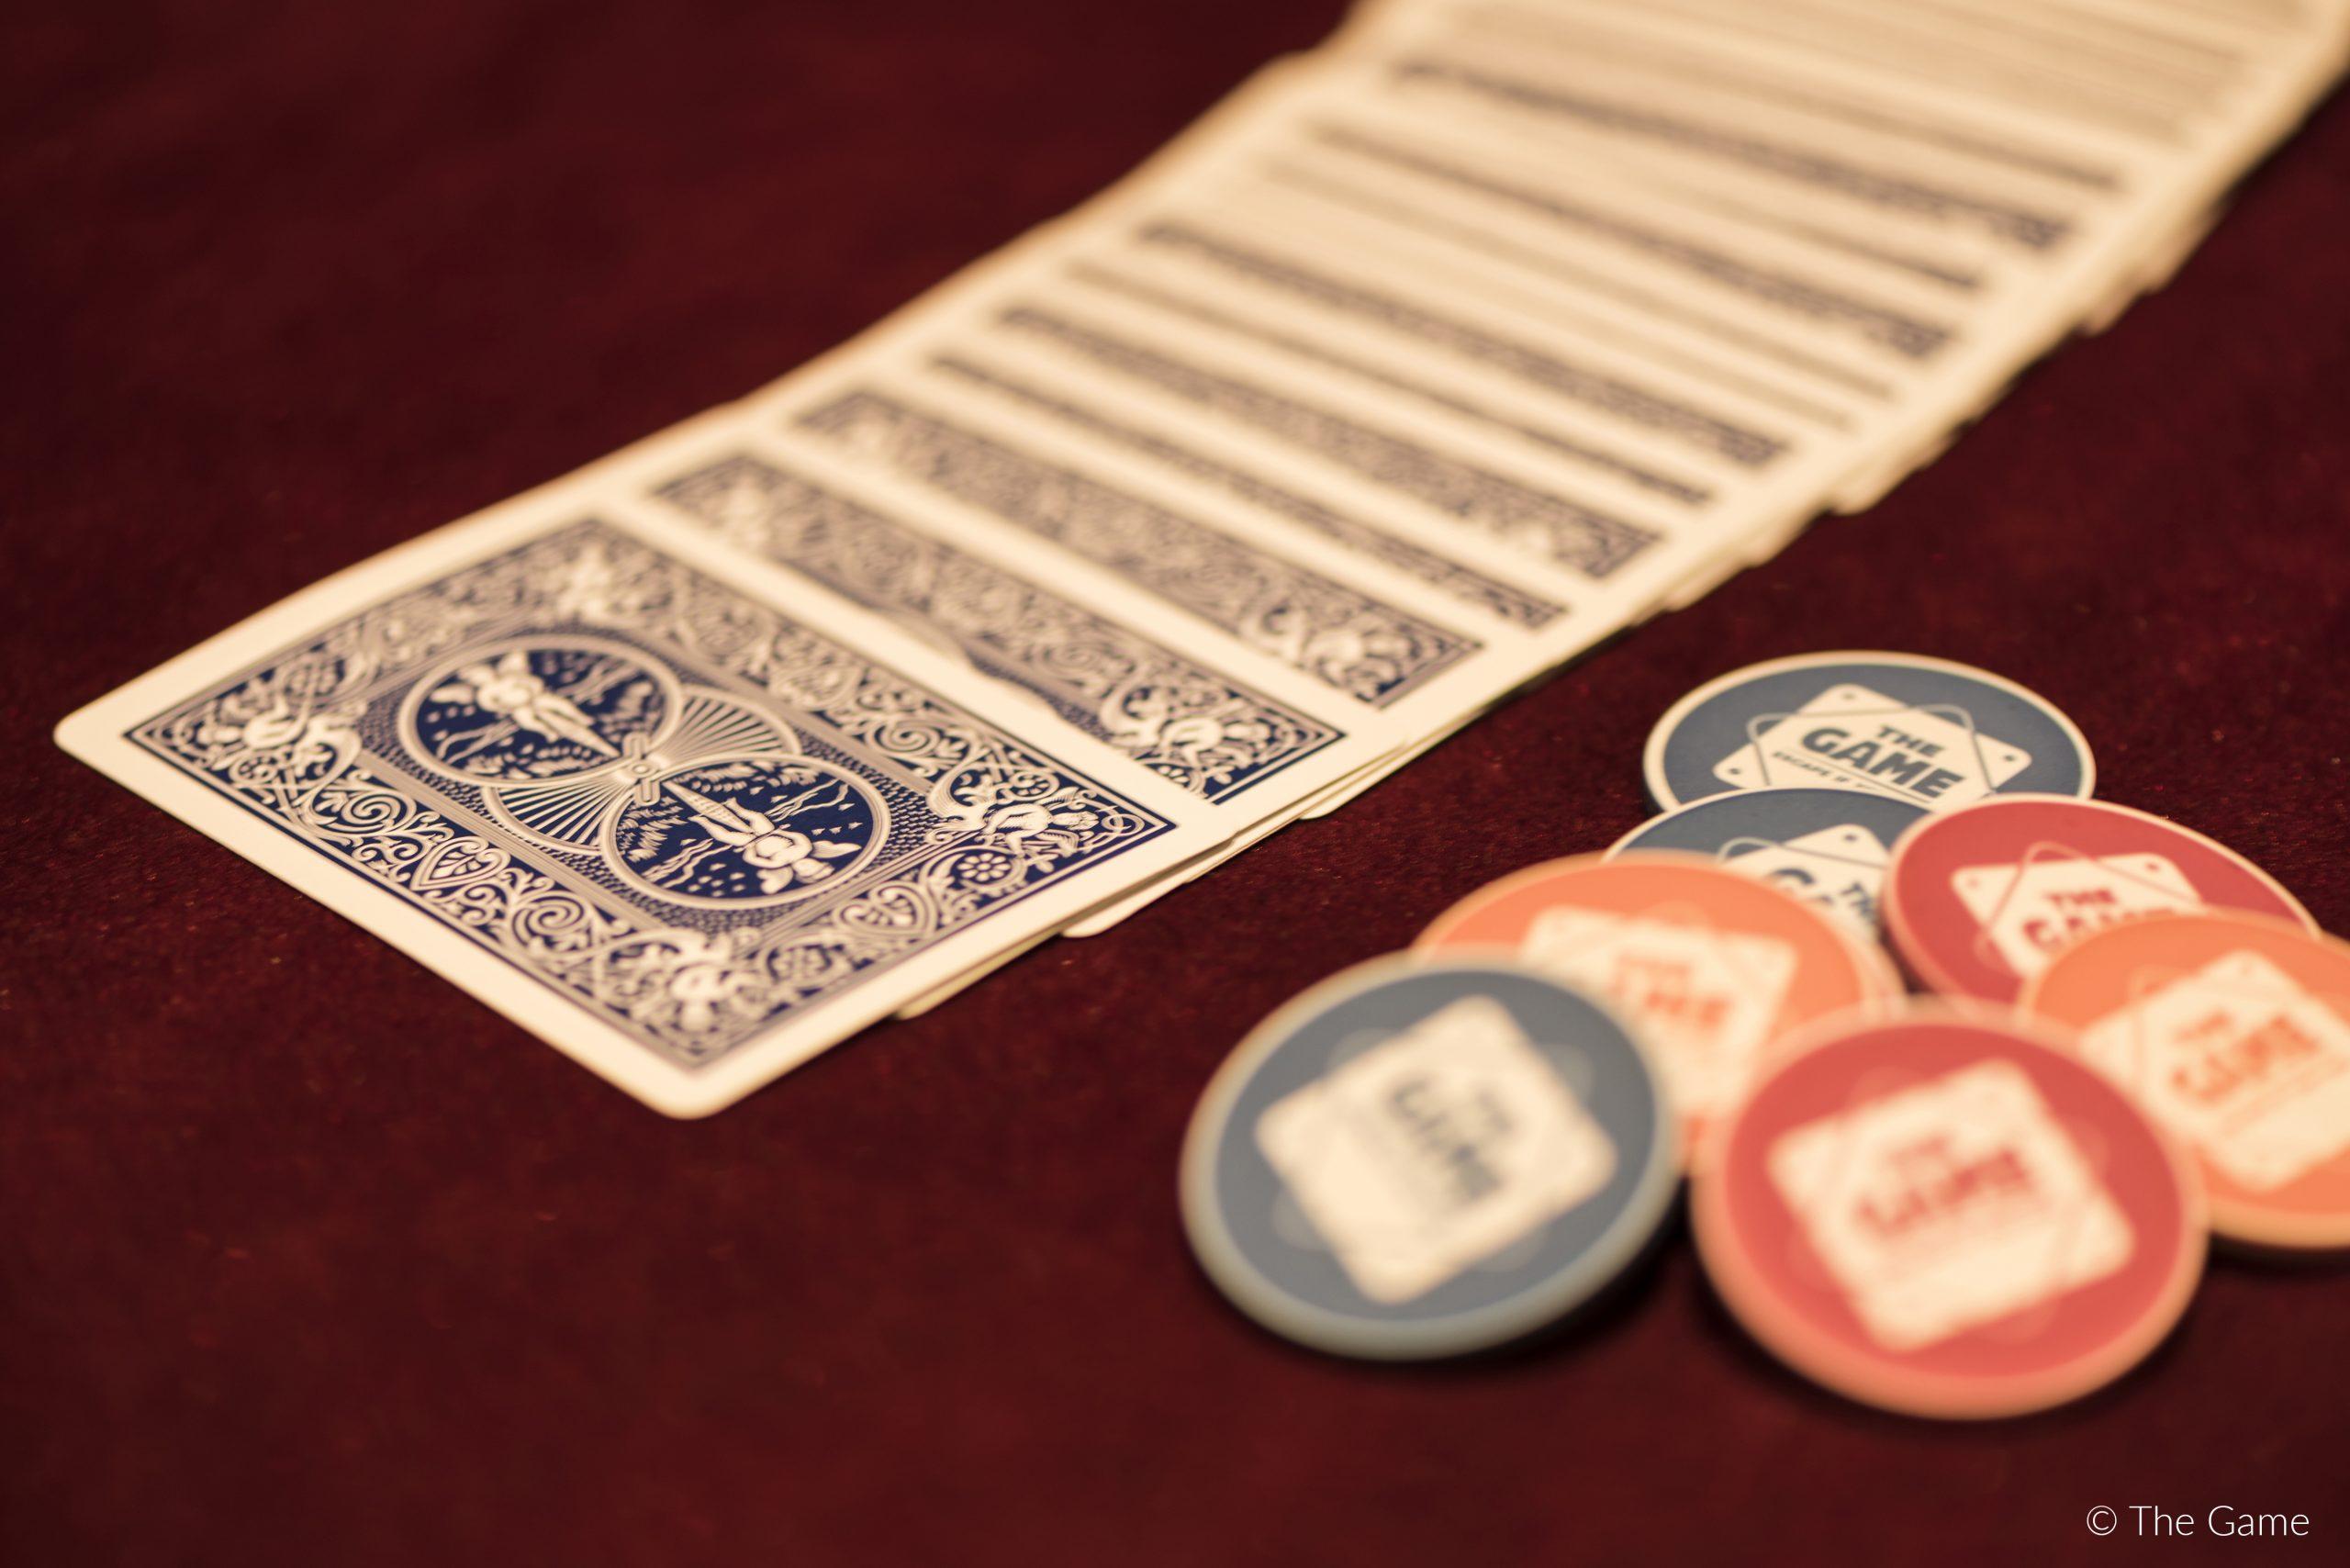 Braquage_du_casino_1.jpg